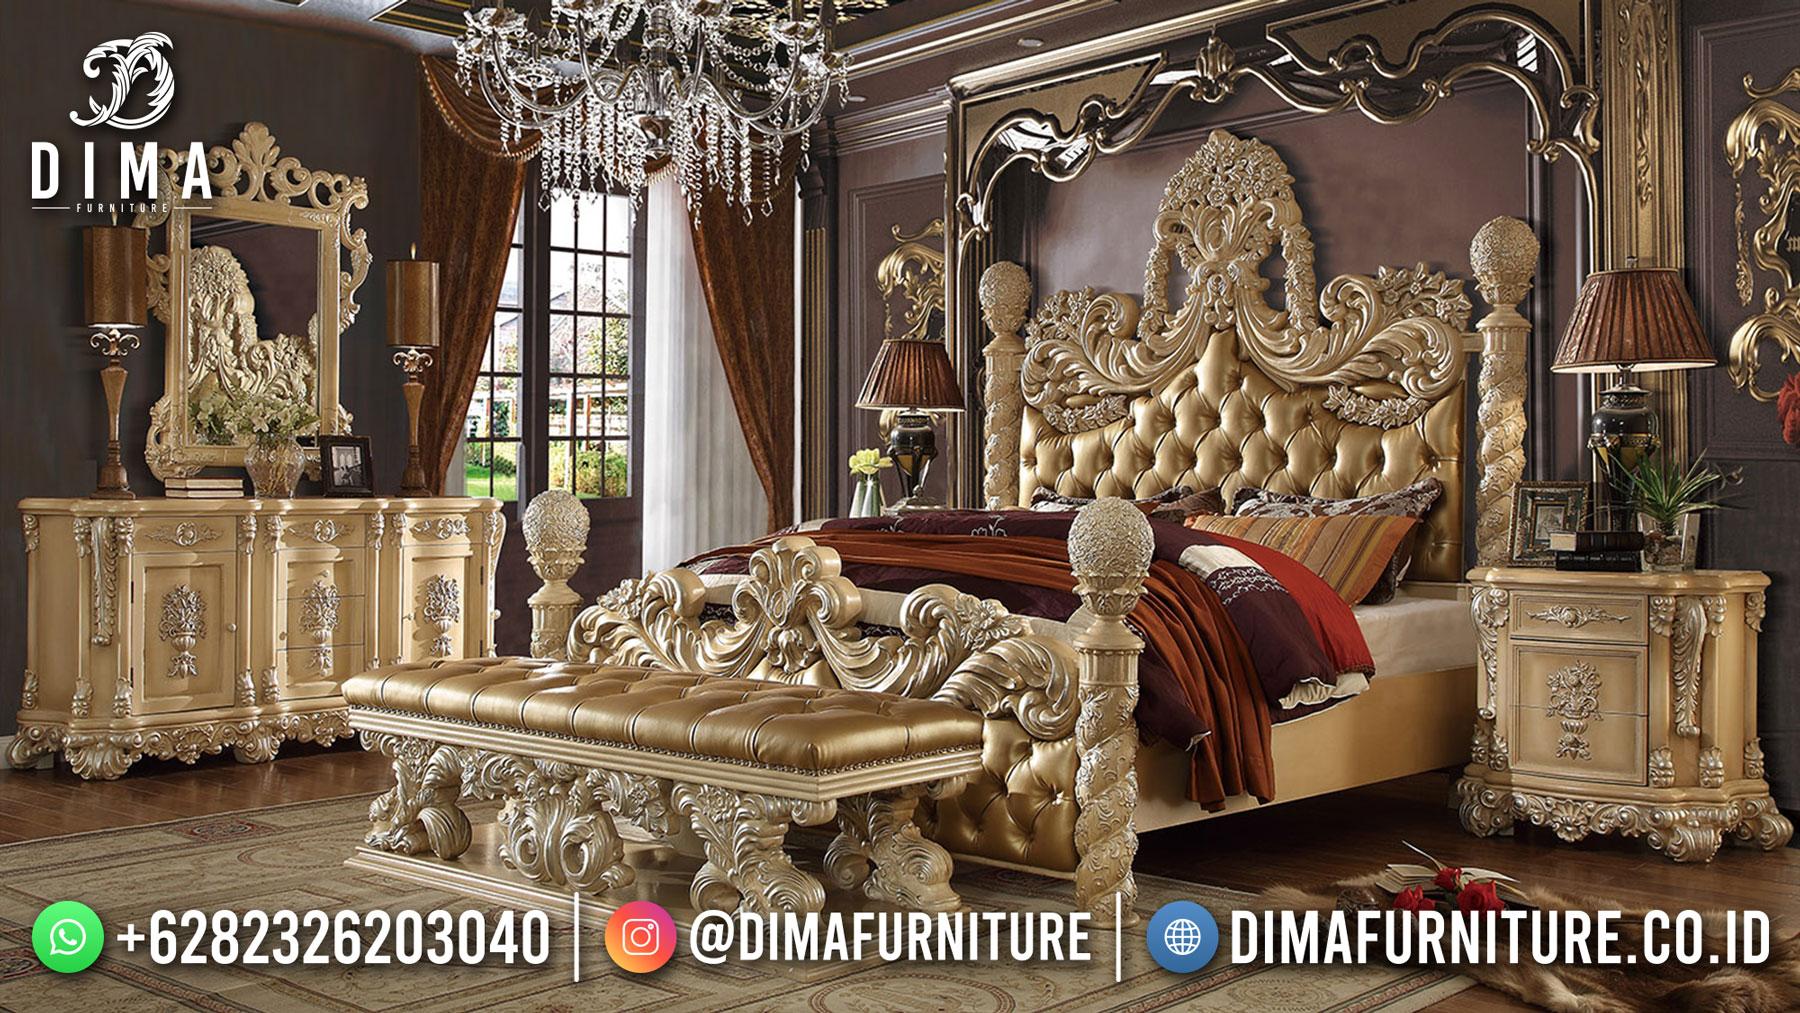 Tempat Tidur Mewah Jepara Ukir Klasik Luxury Design DF-1560